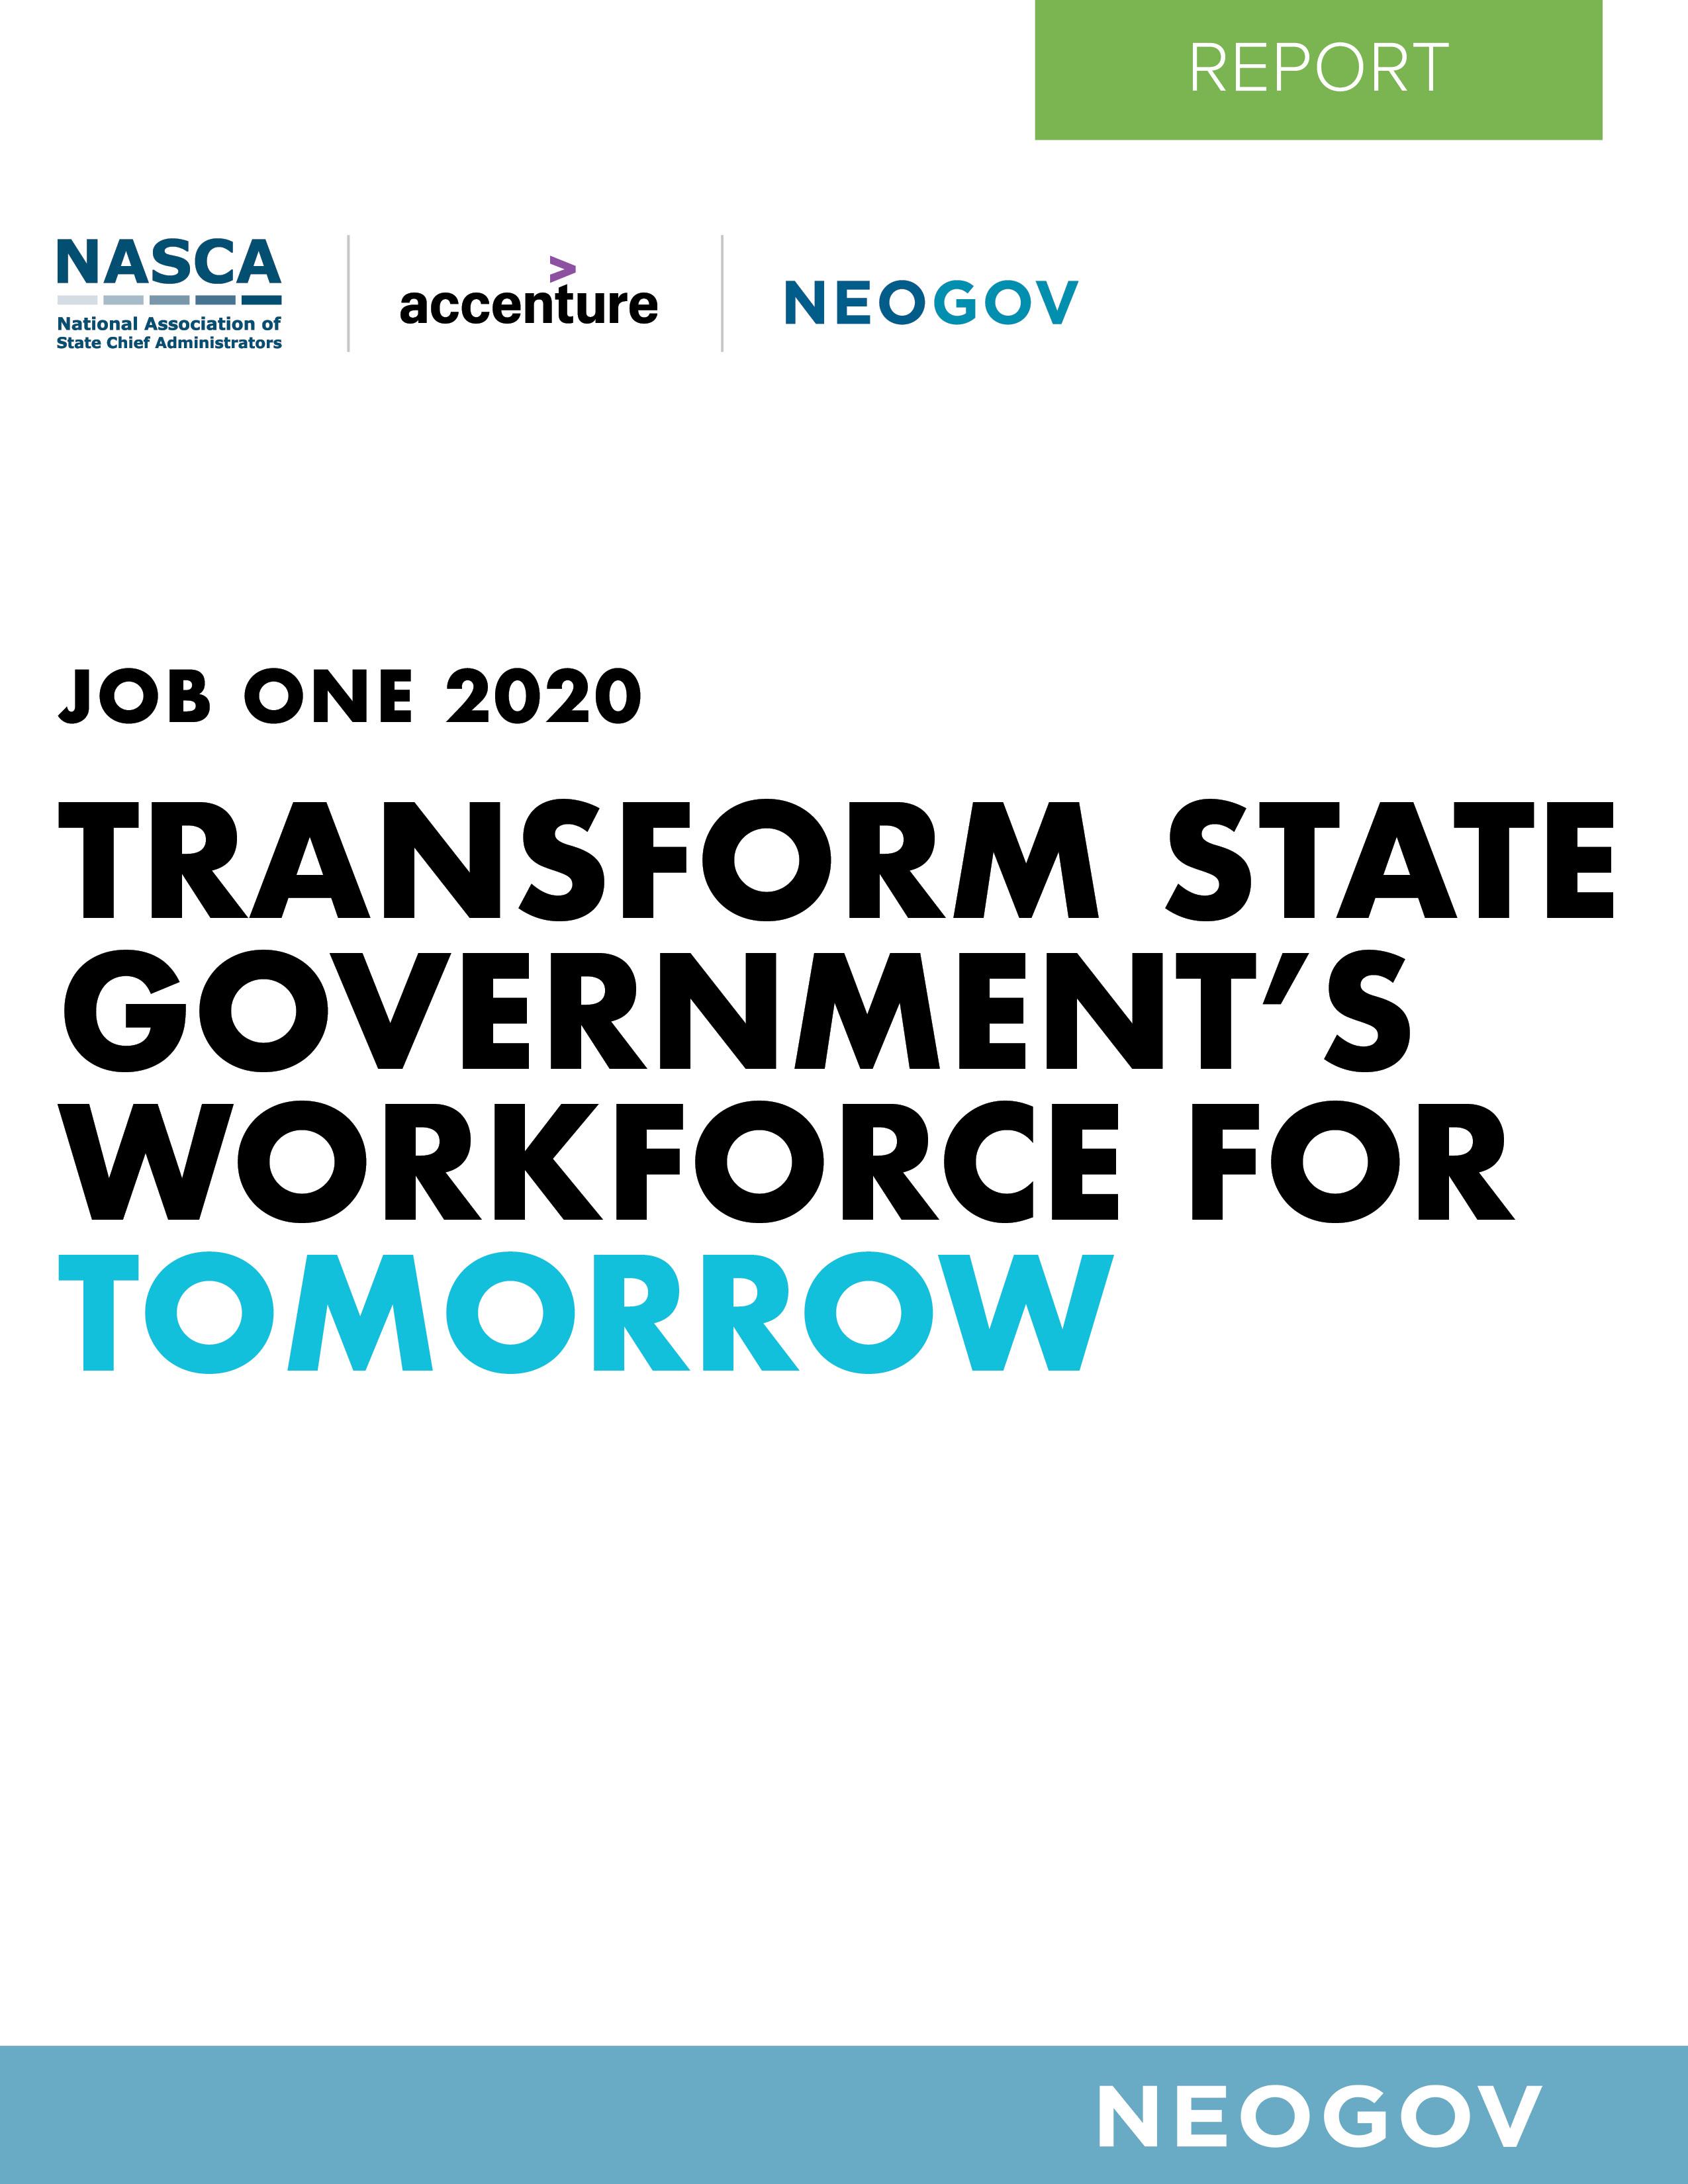 NEOGOV - 2020 NASCA Job One Report